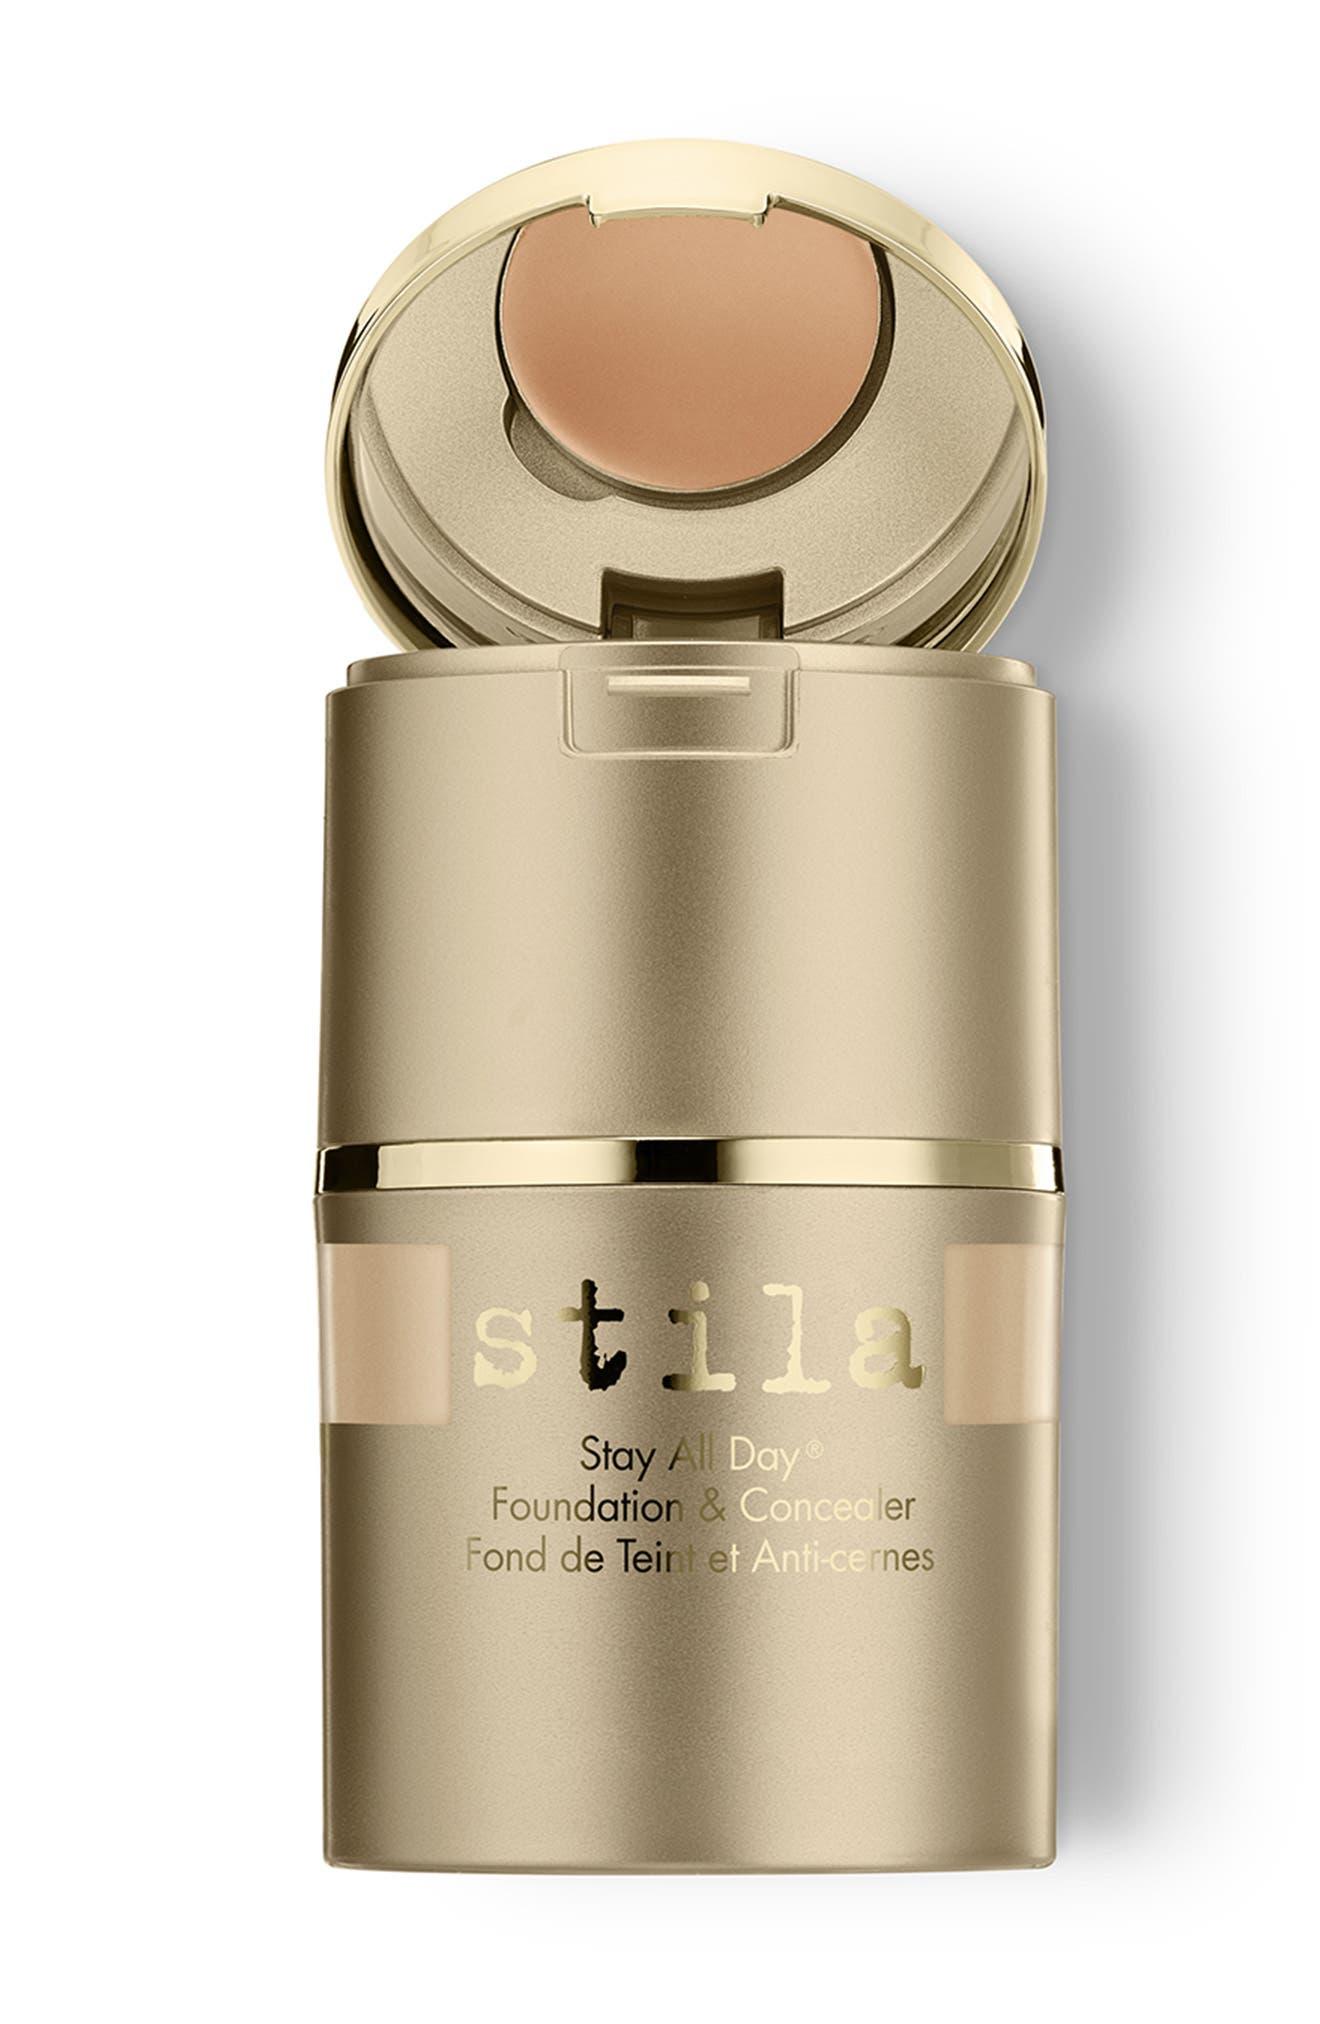 Image of Stila Stay All Day Foundation & Concealer - Light